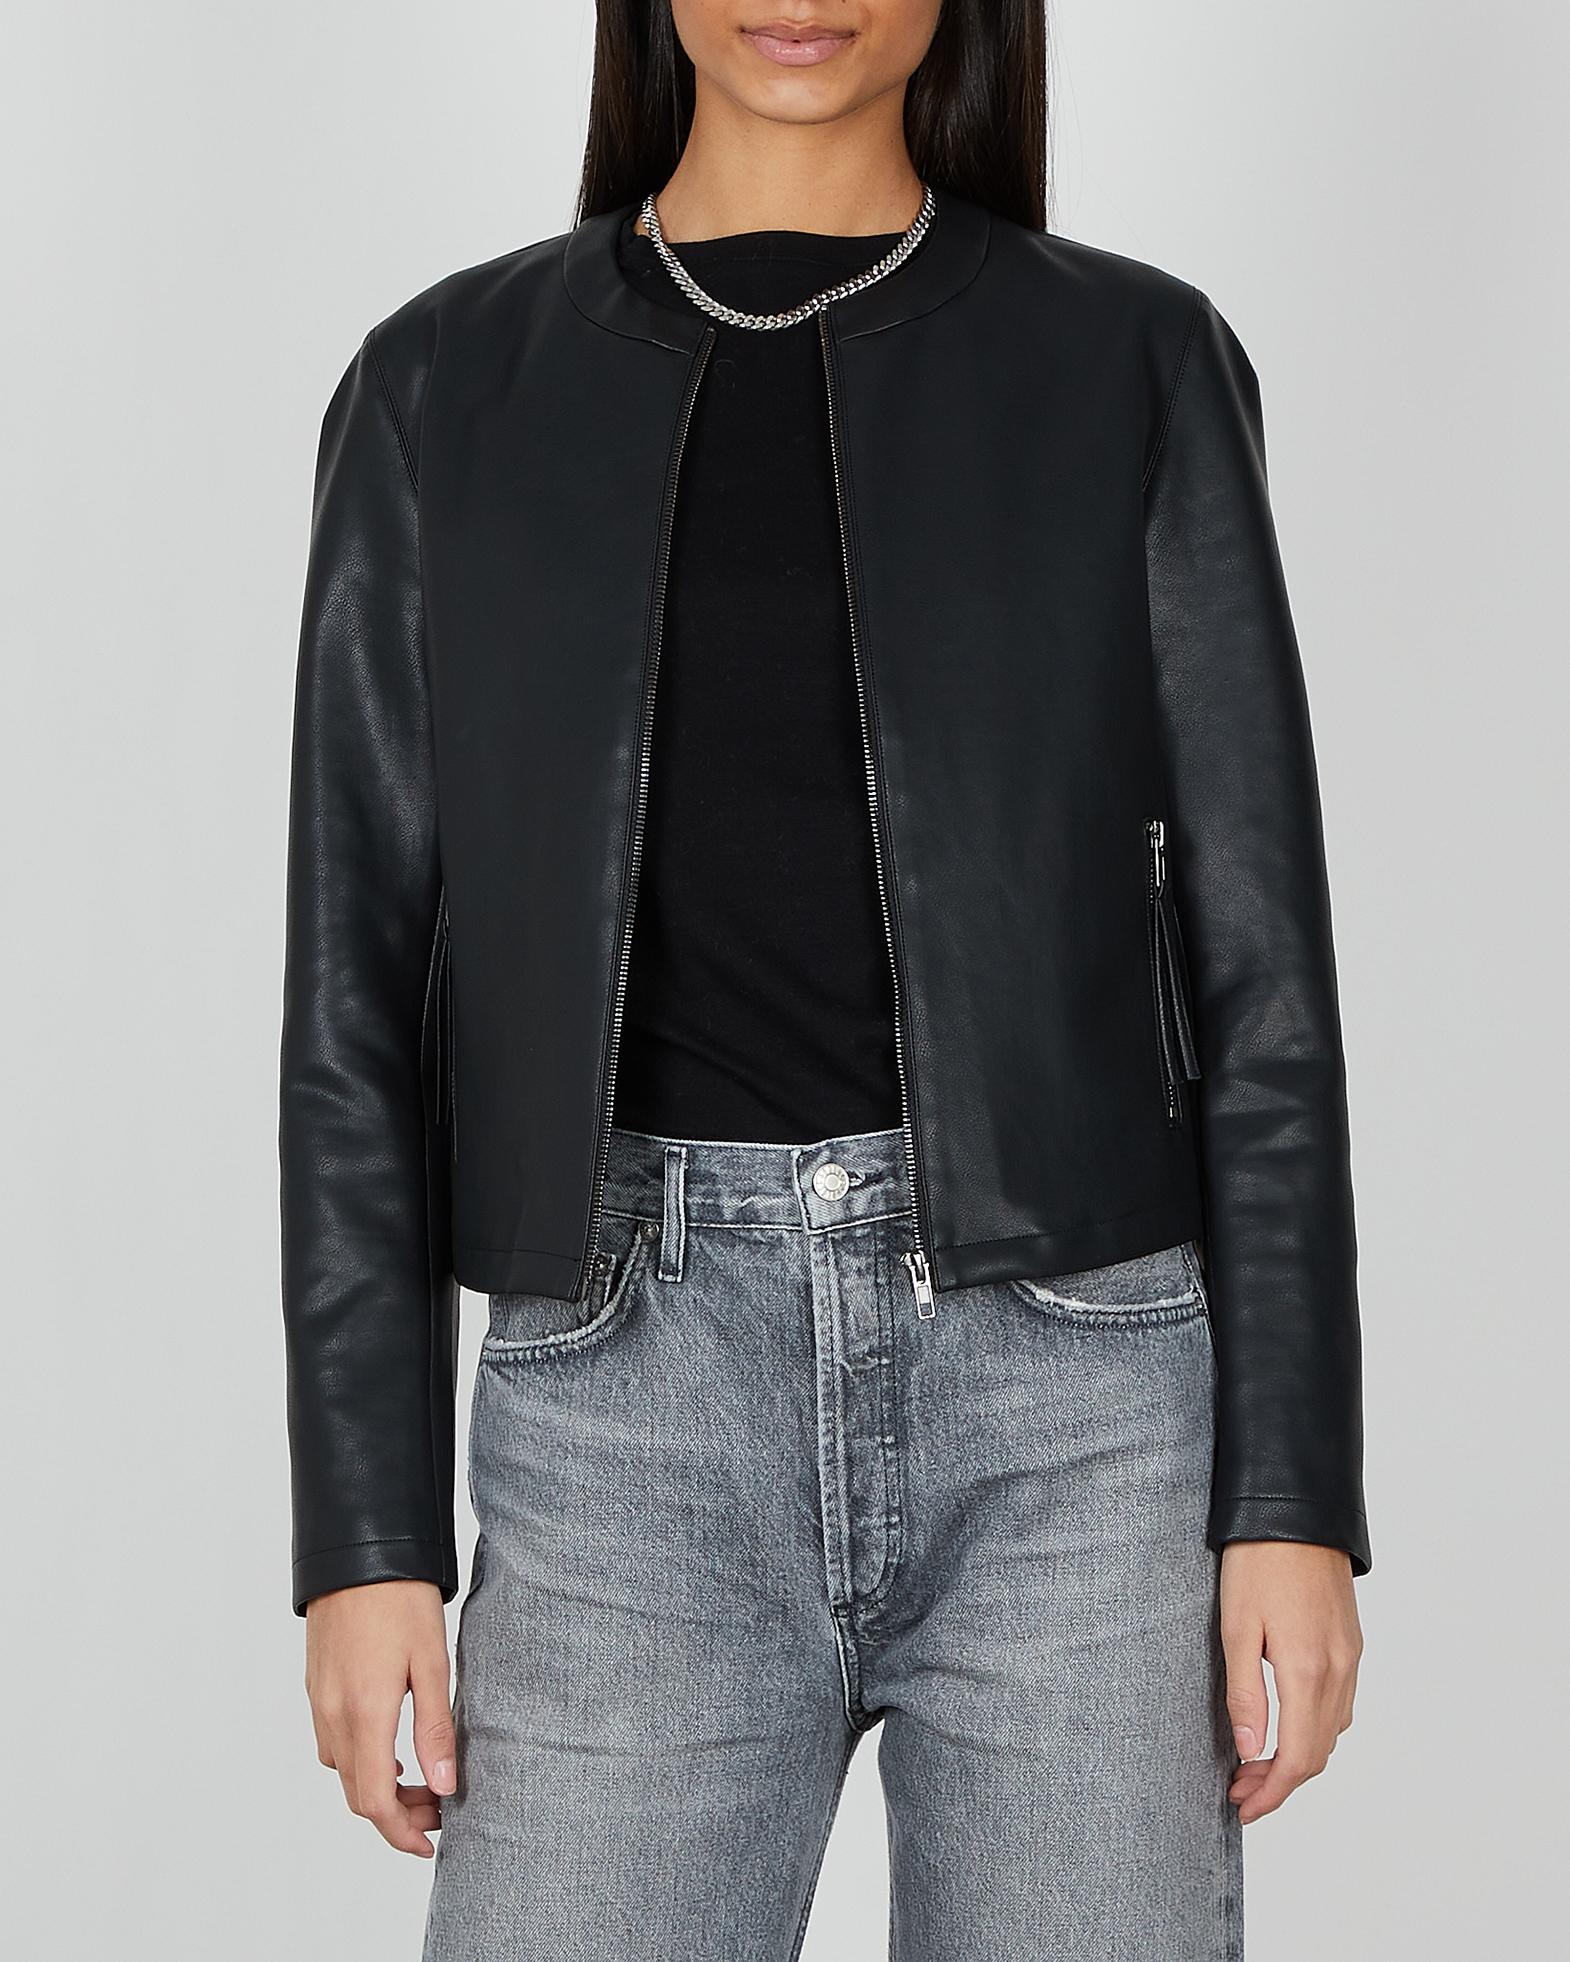 Wakakuu Icons Jacka Faux Leather svart XS